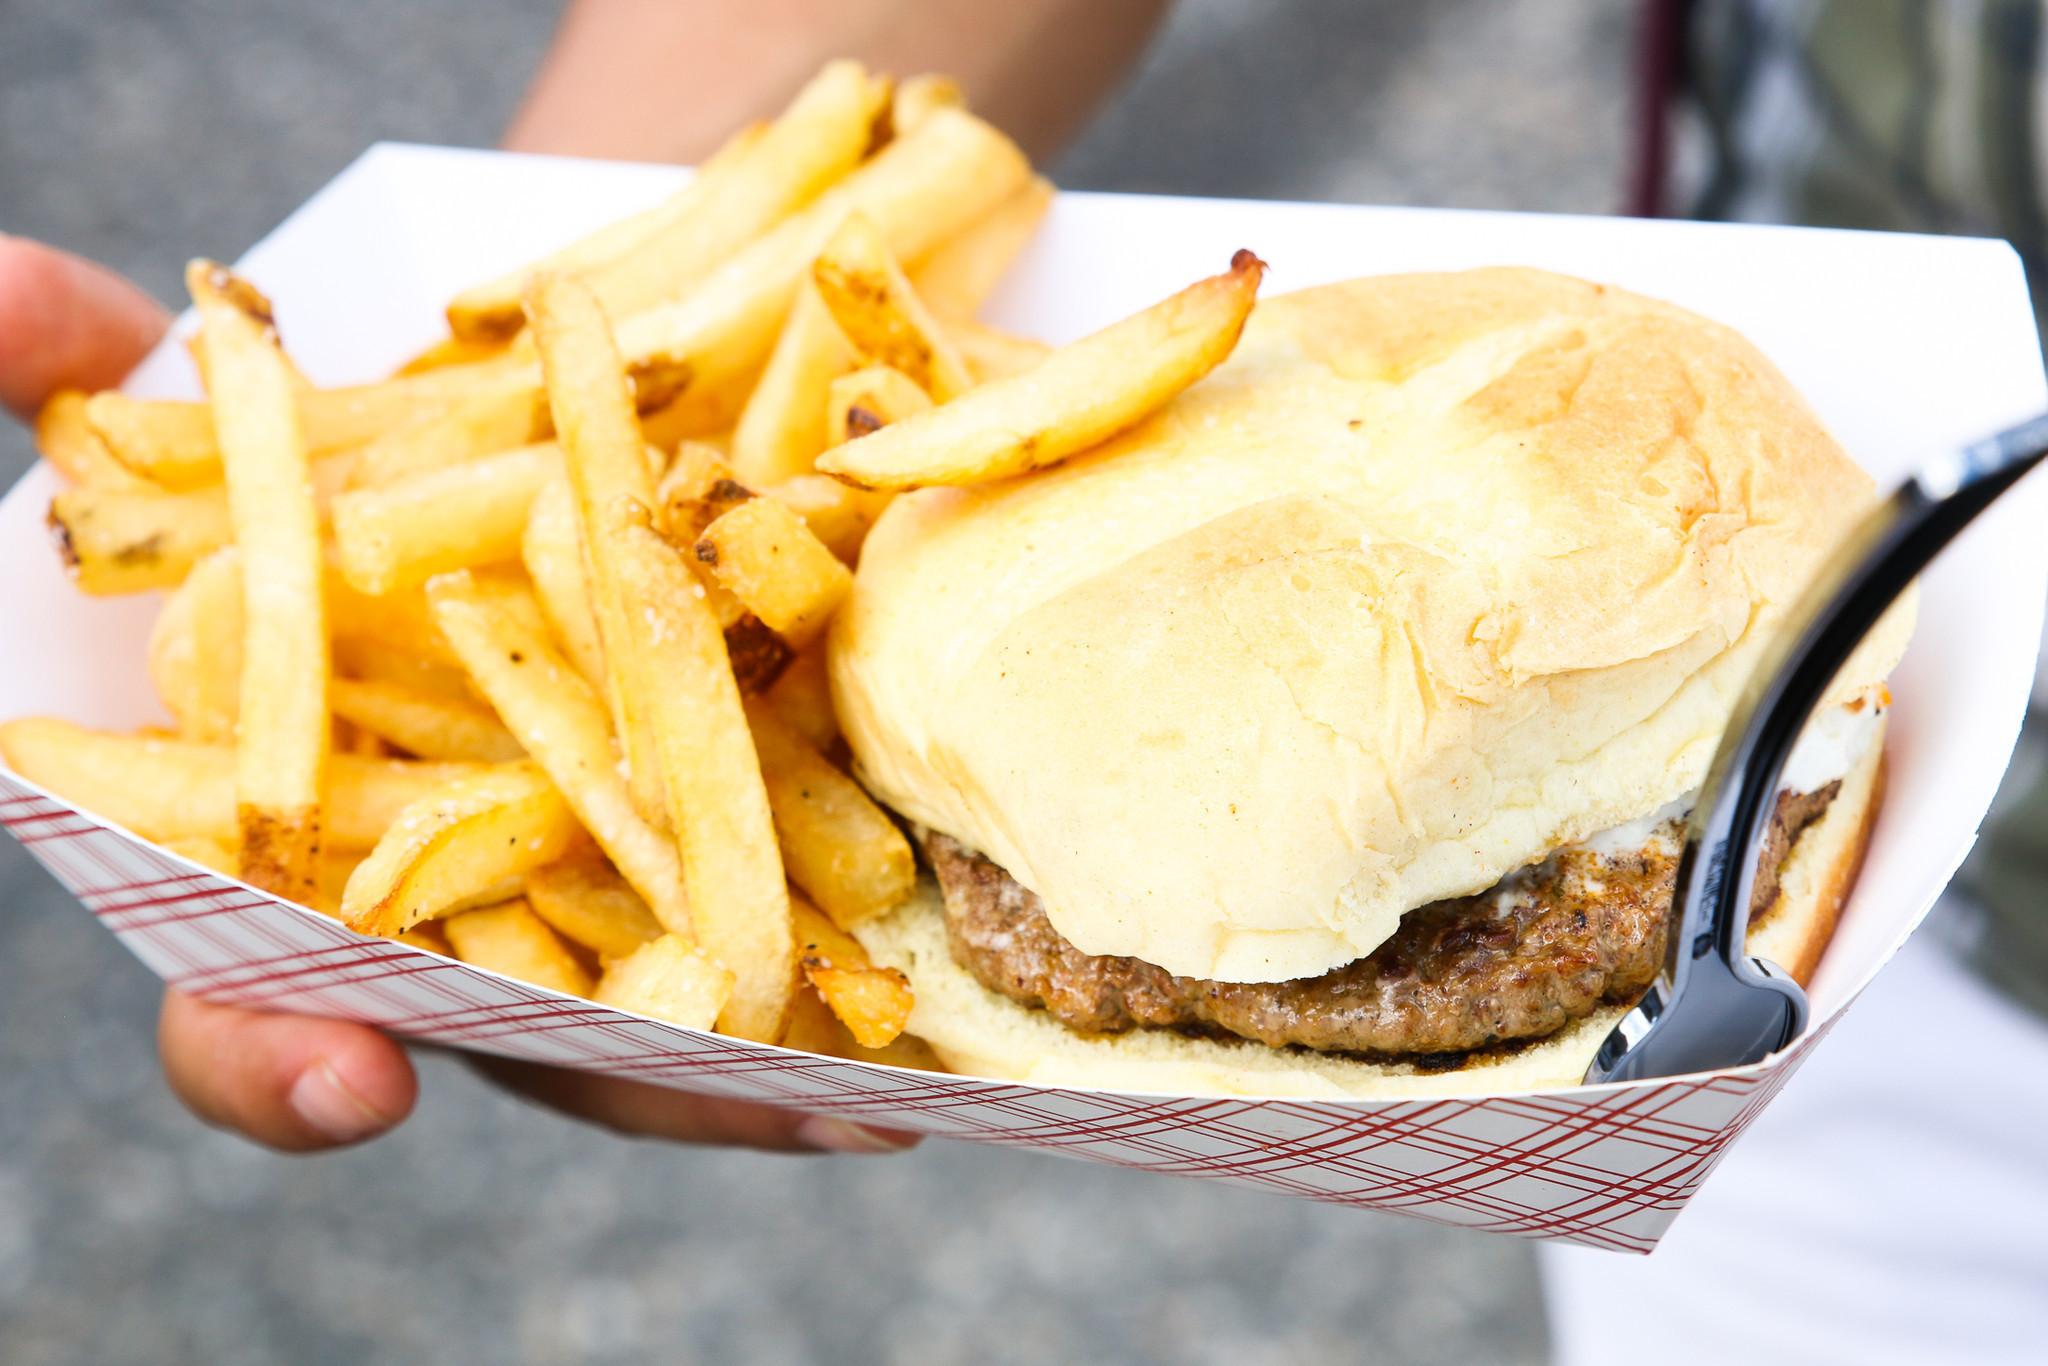 Mohegan Food Truck Festival